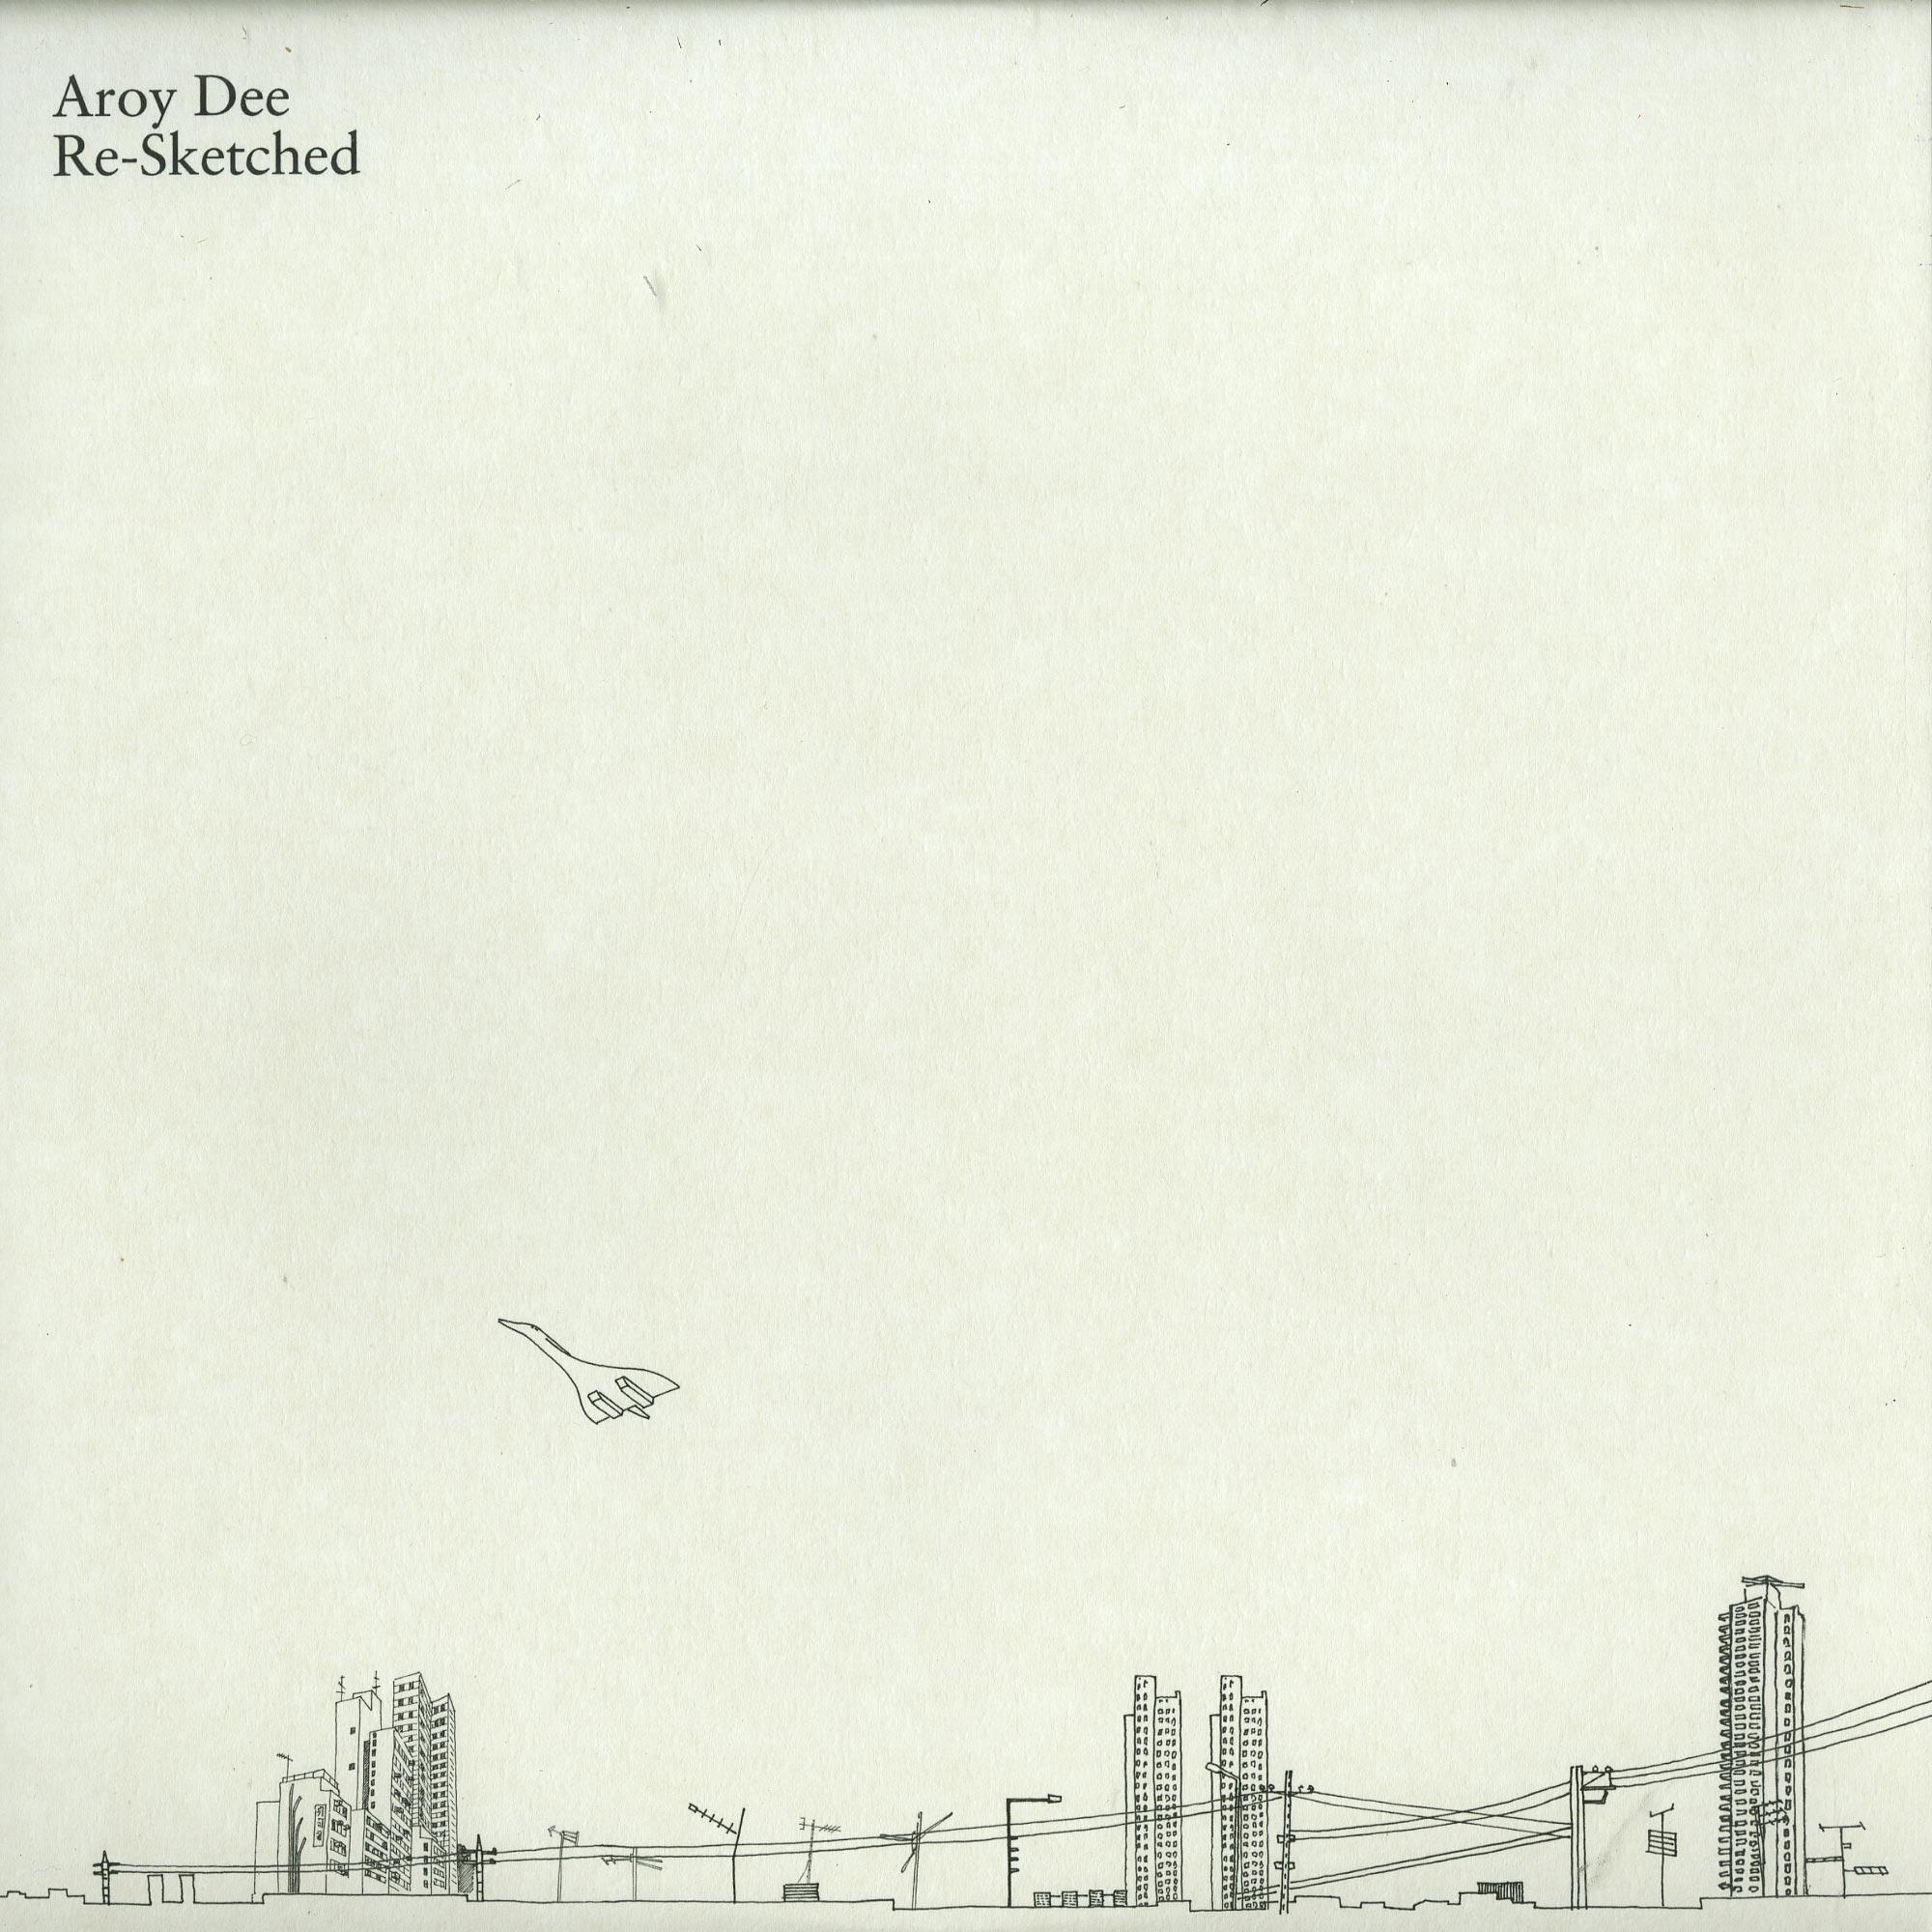 Aroy Dee - RE-SKETCHED